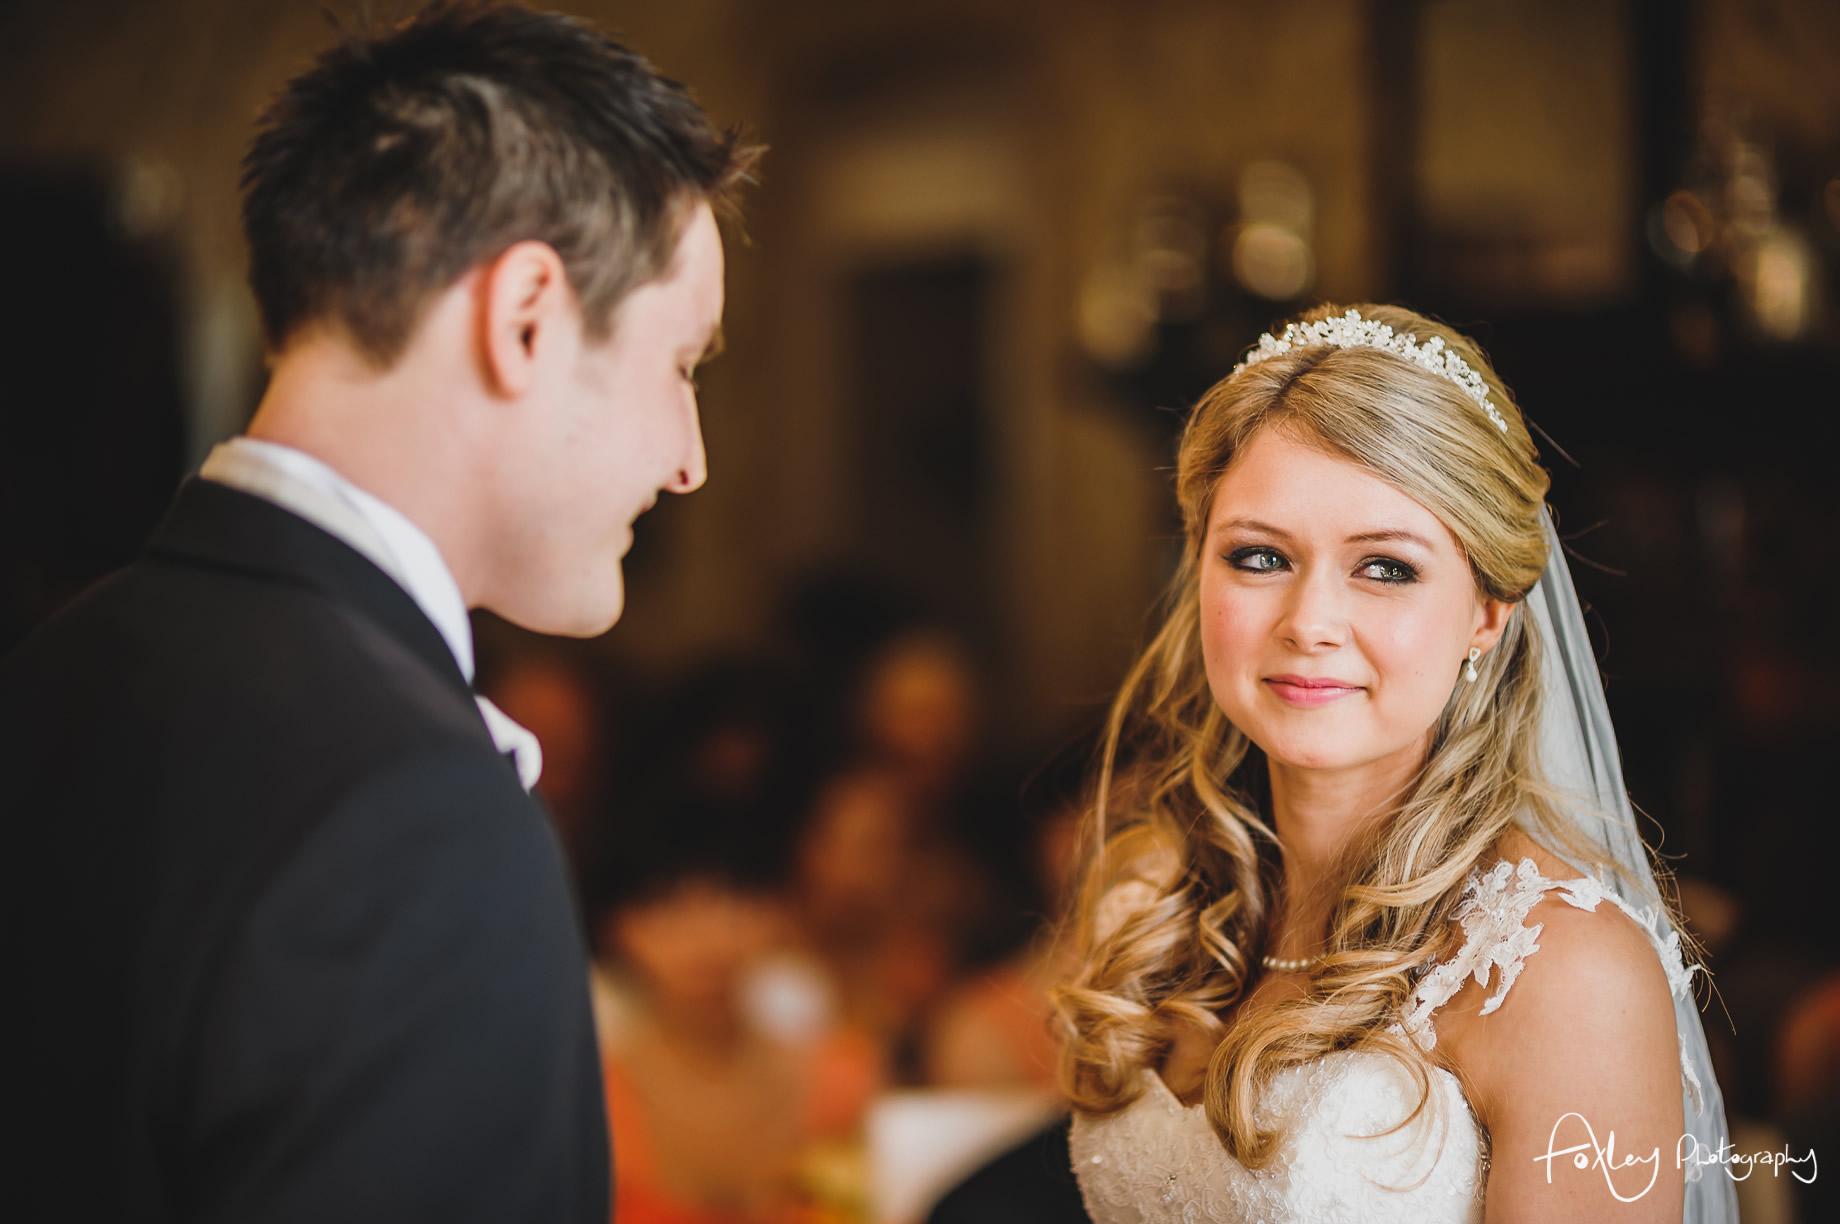 Gemma and Lewis' Wedding at Mitton Hall 074